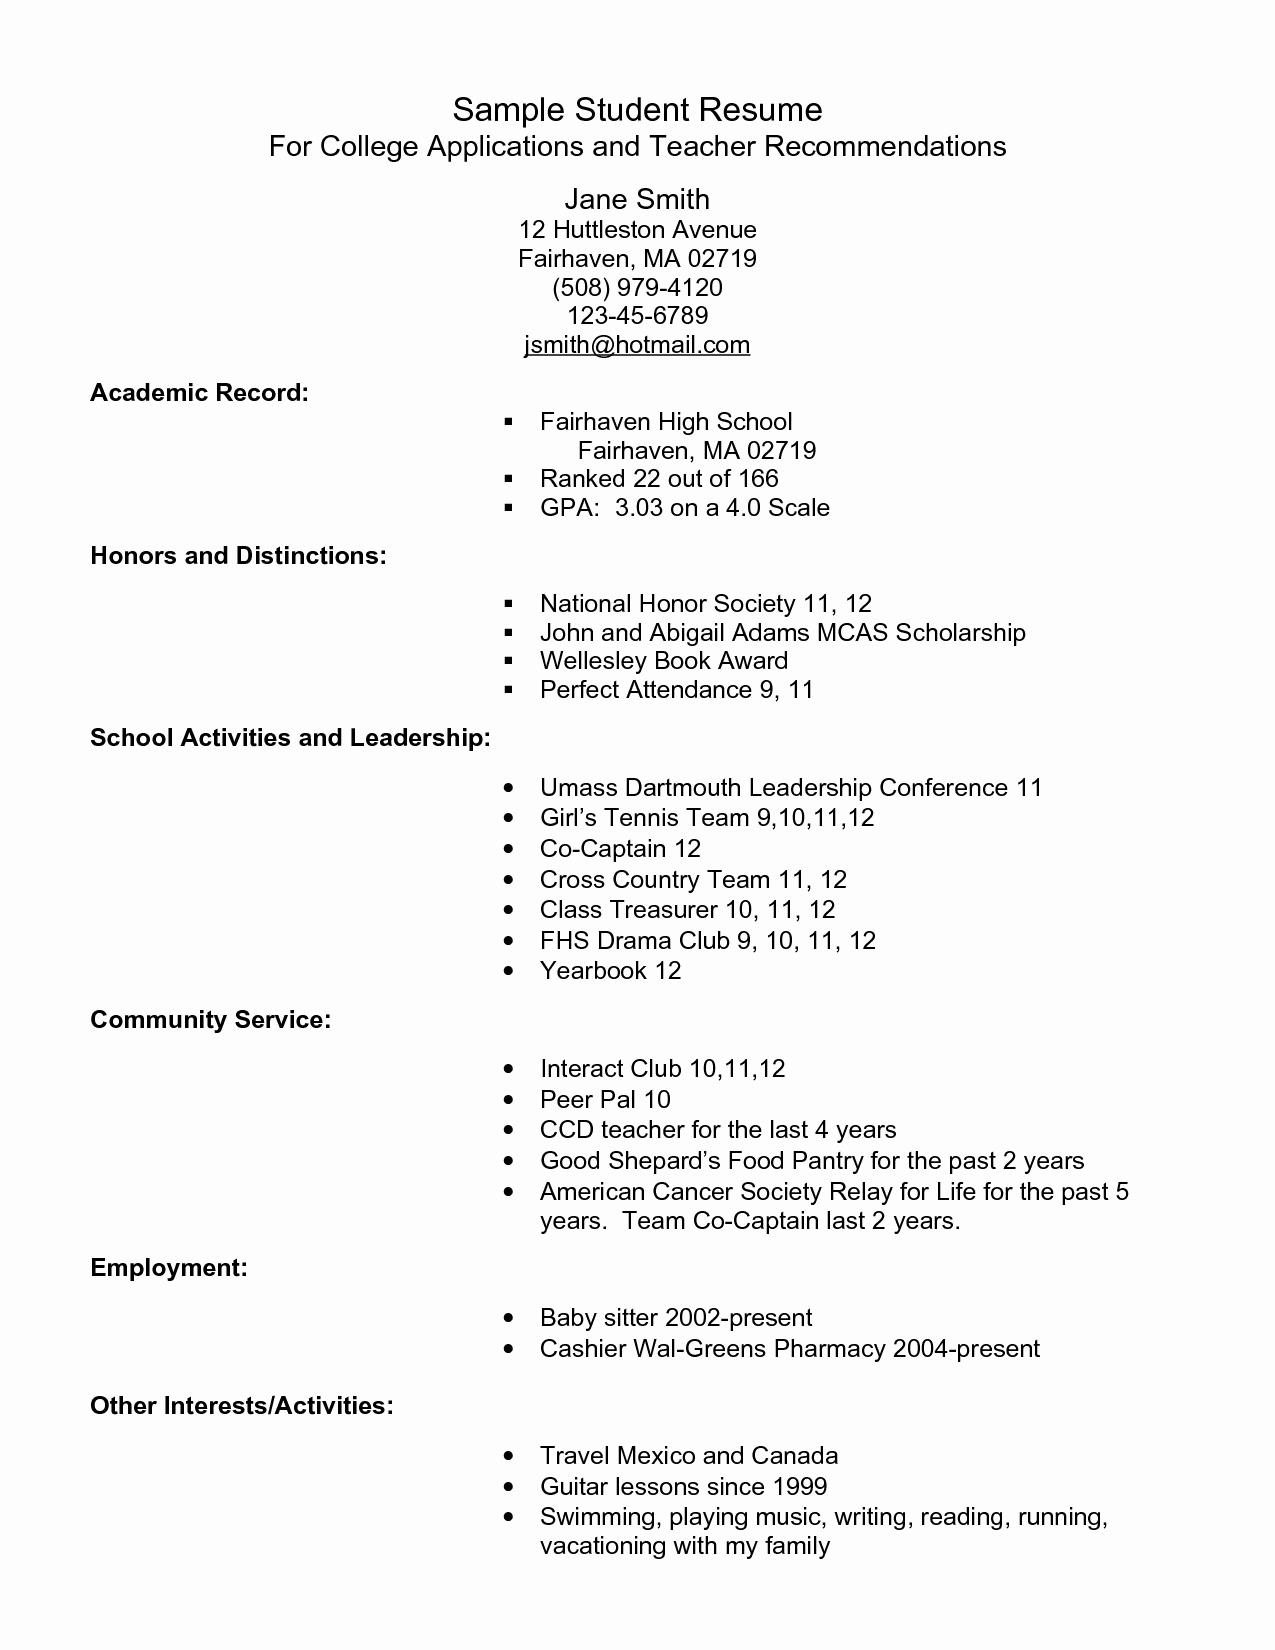 Sample High School Student Resume Fresh Example Resume for High School Students for College